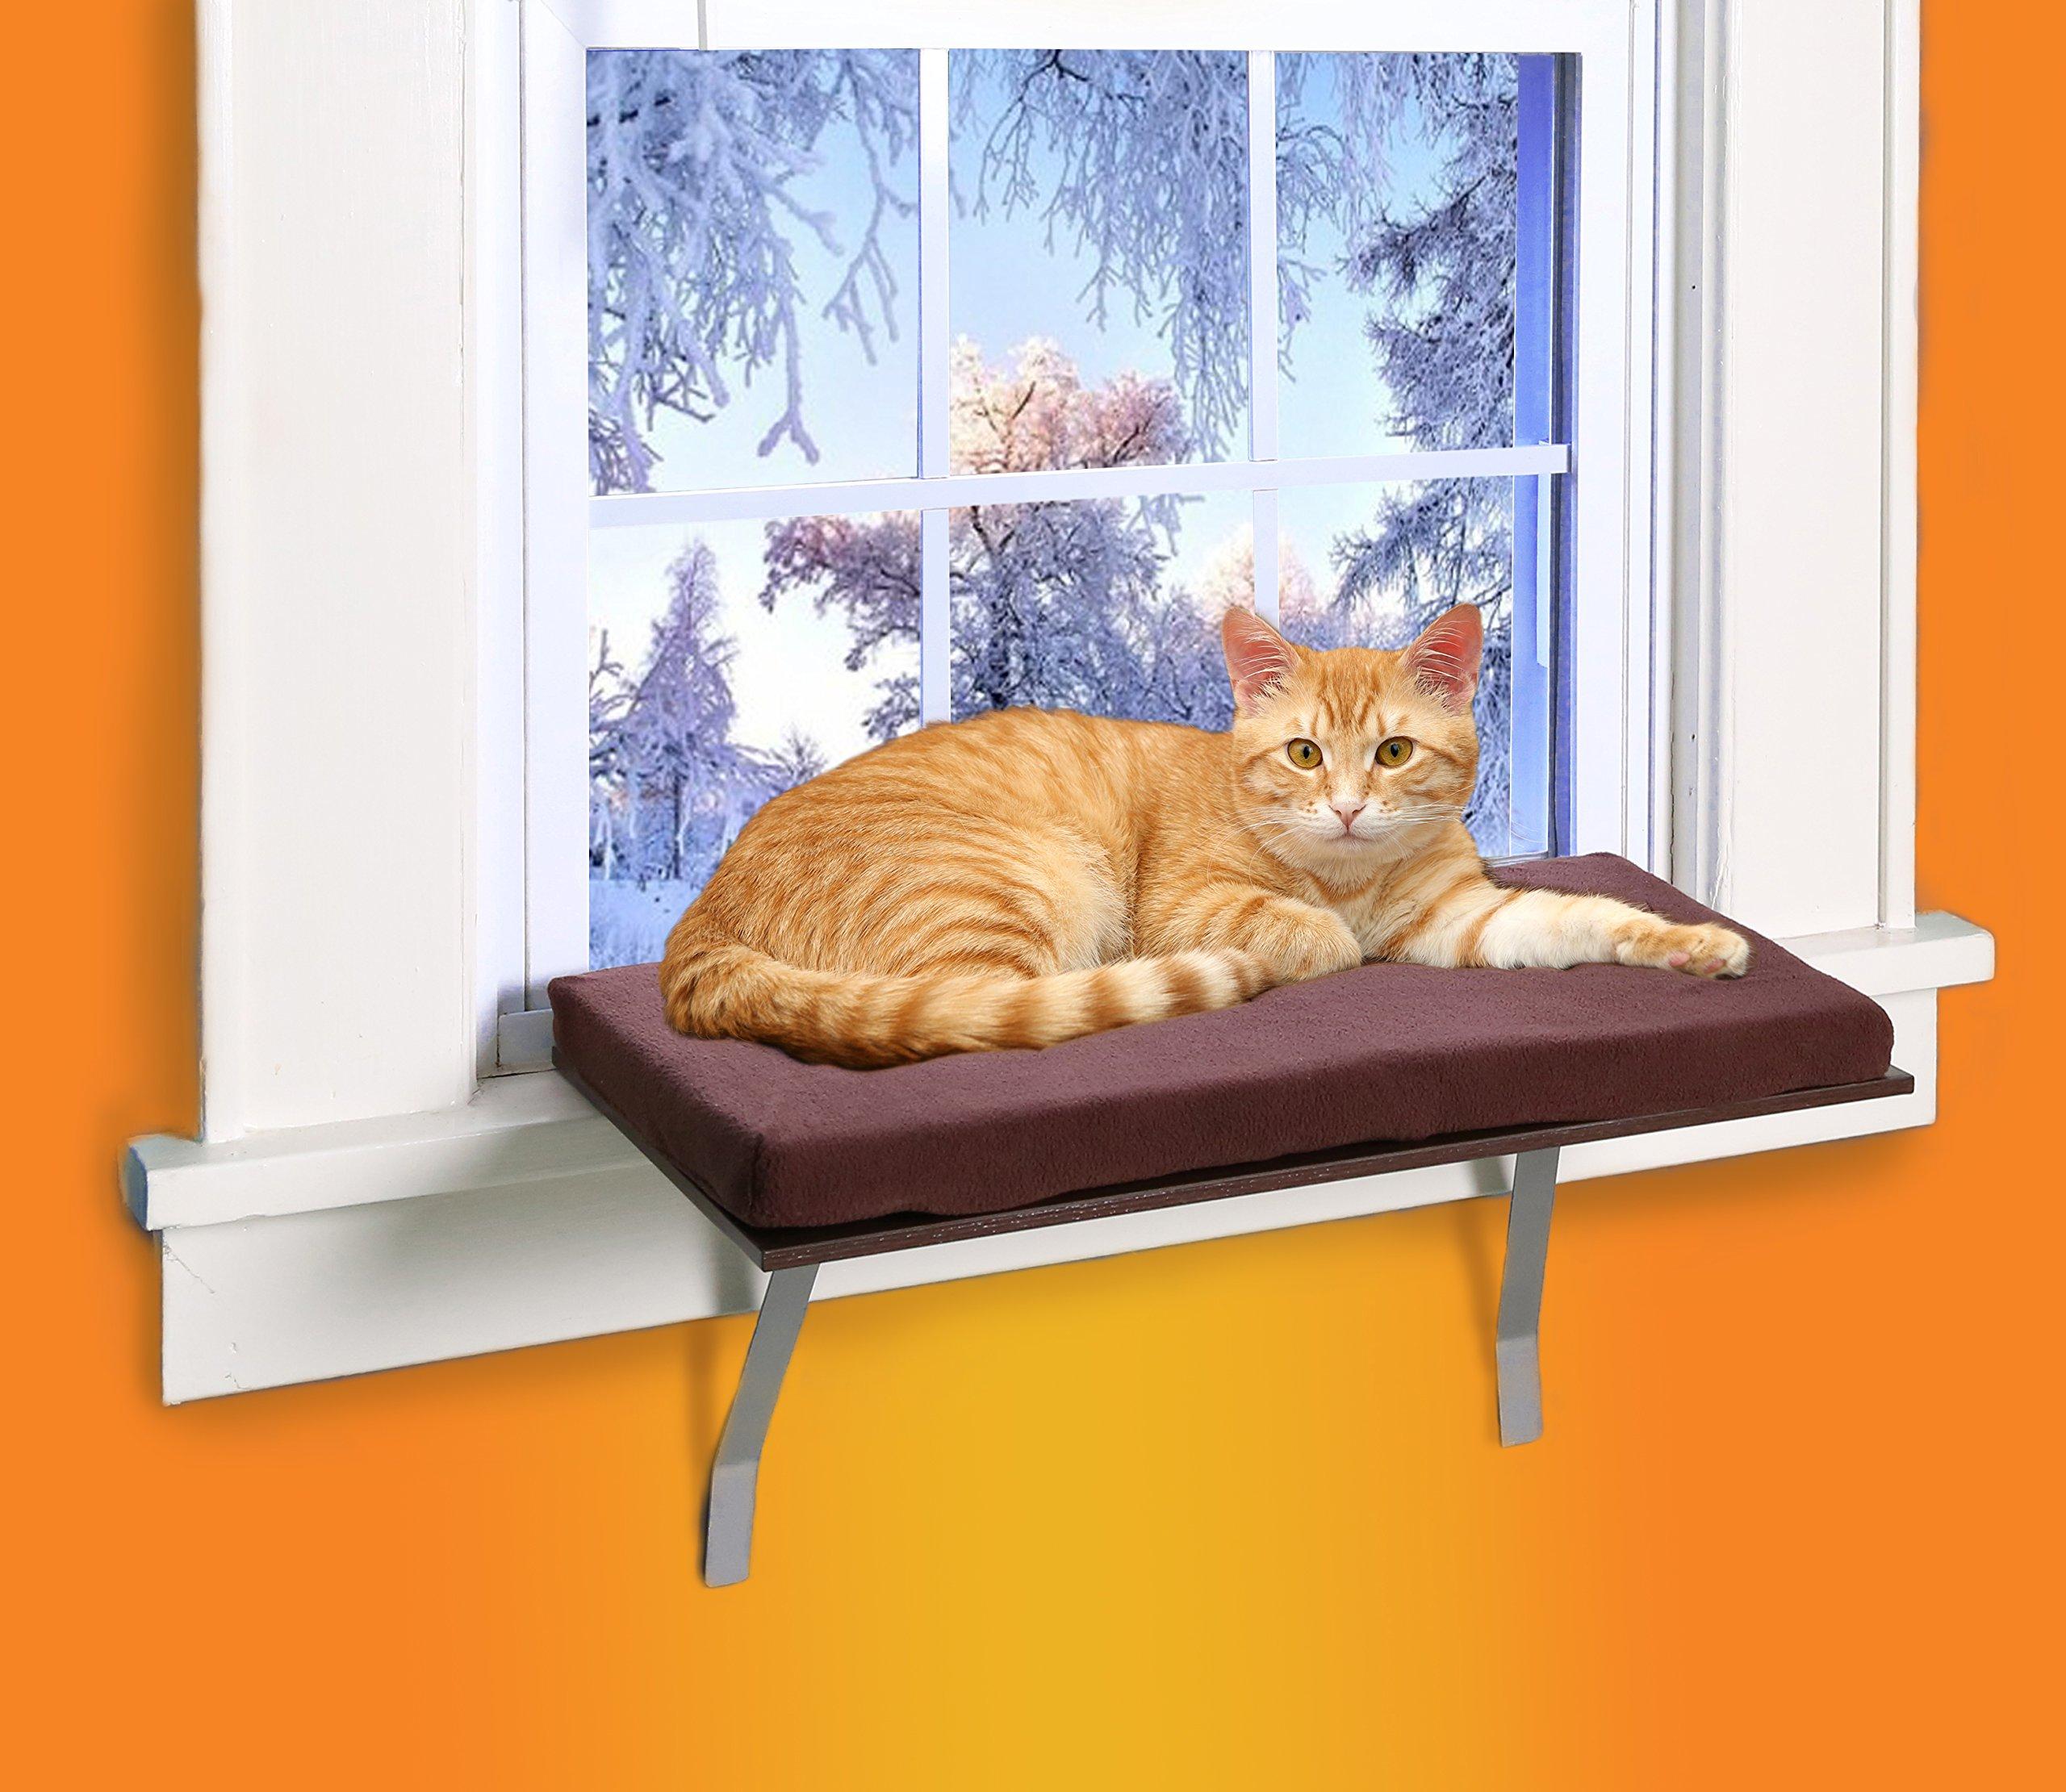 KLEEGER Cat Window Perch seat: Sunny Kitty Window Sill Shelf, With Fleece Foam Cushion & Washable Cover - Easy Setup